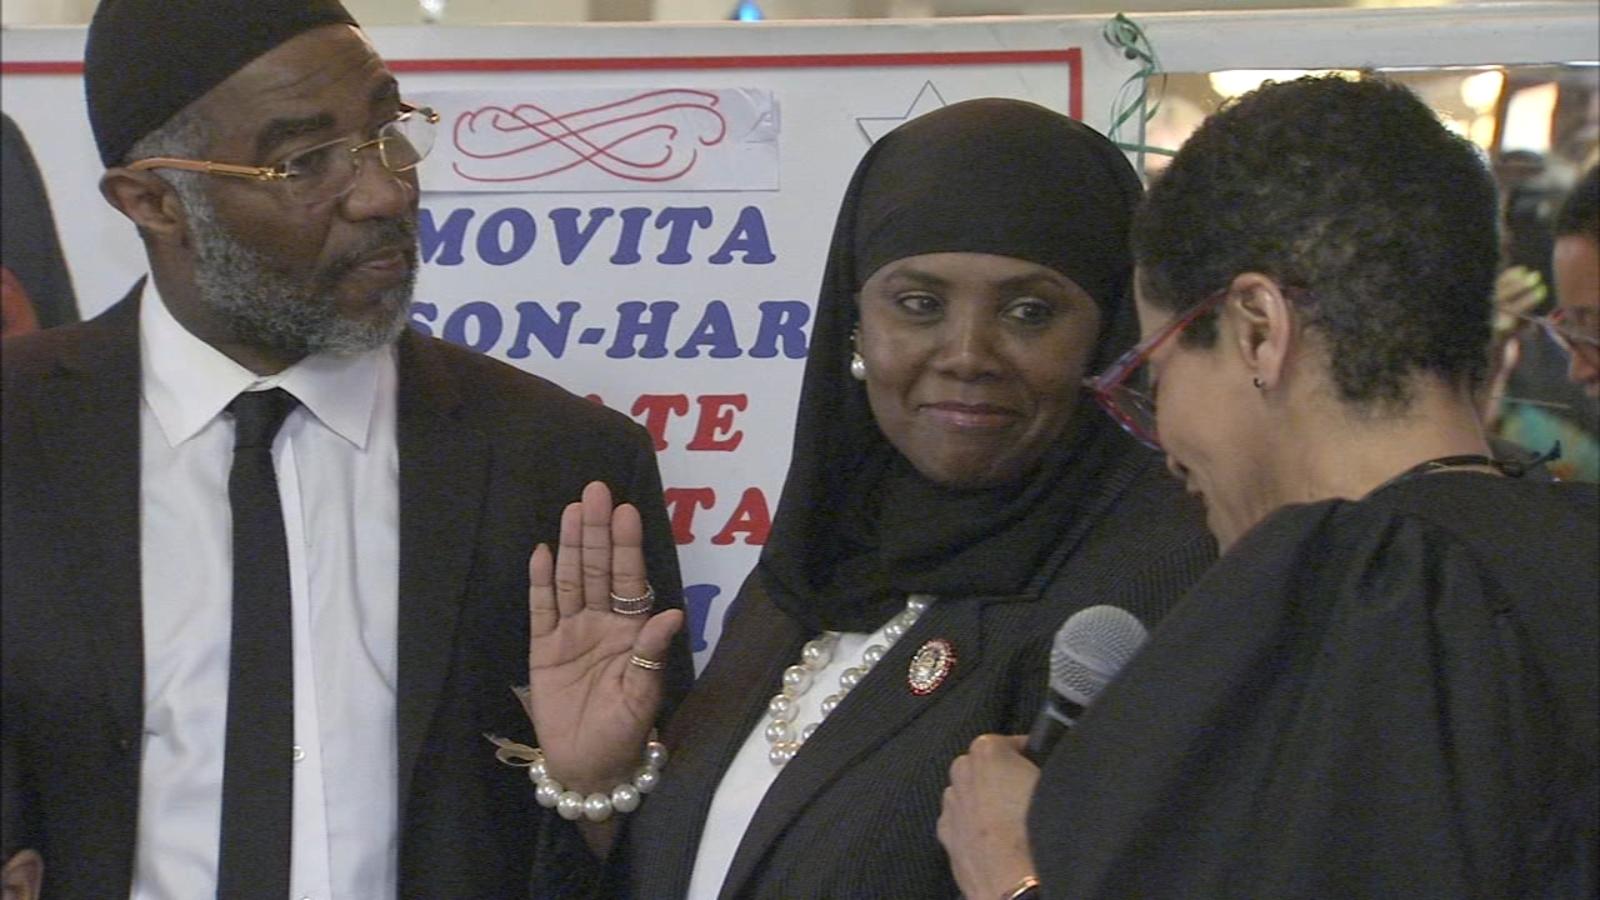 Movita Johnson-Harrell, first Muslim woman in Pa. House, sworn in locally